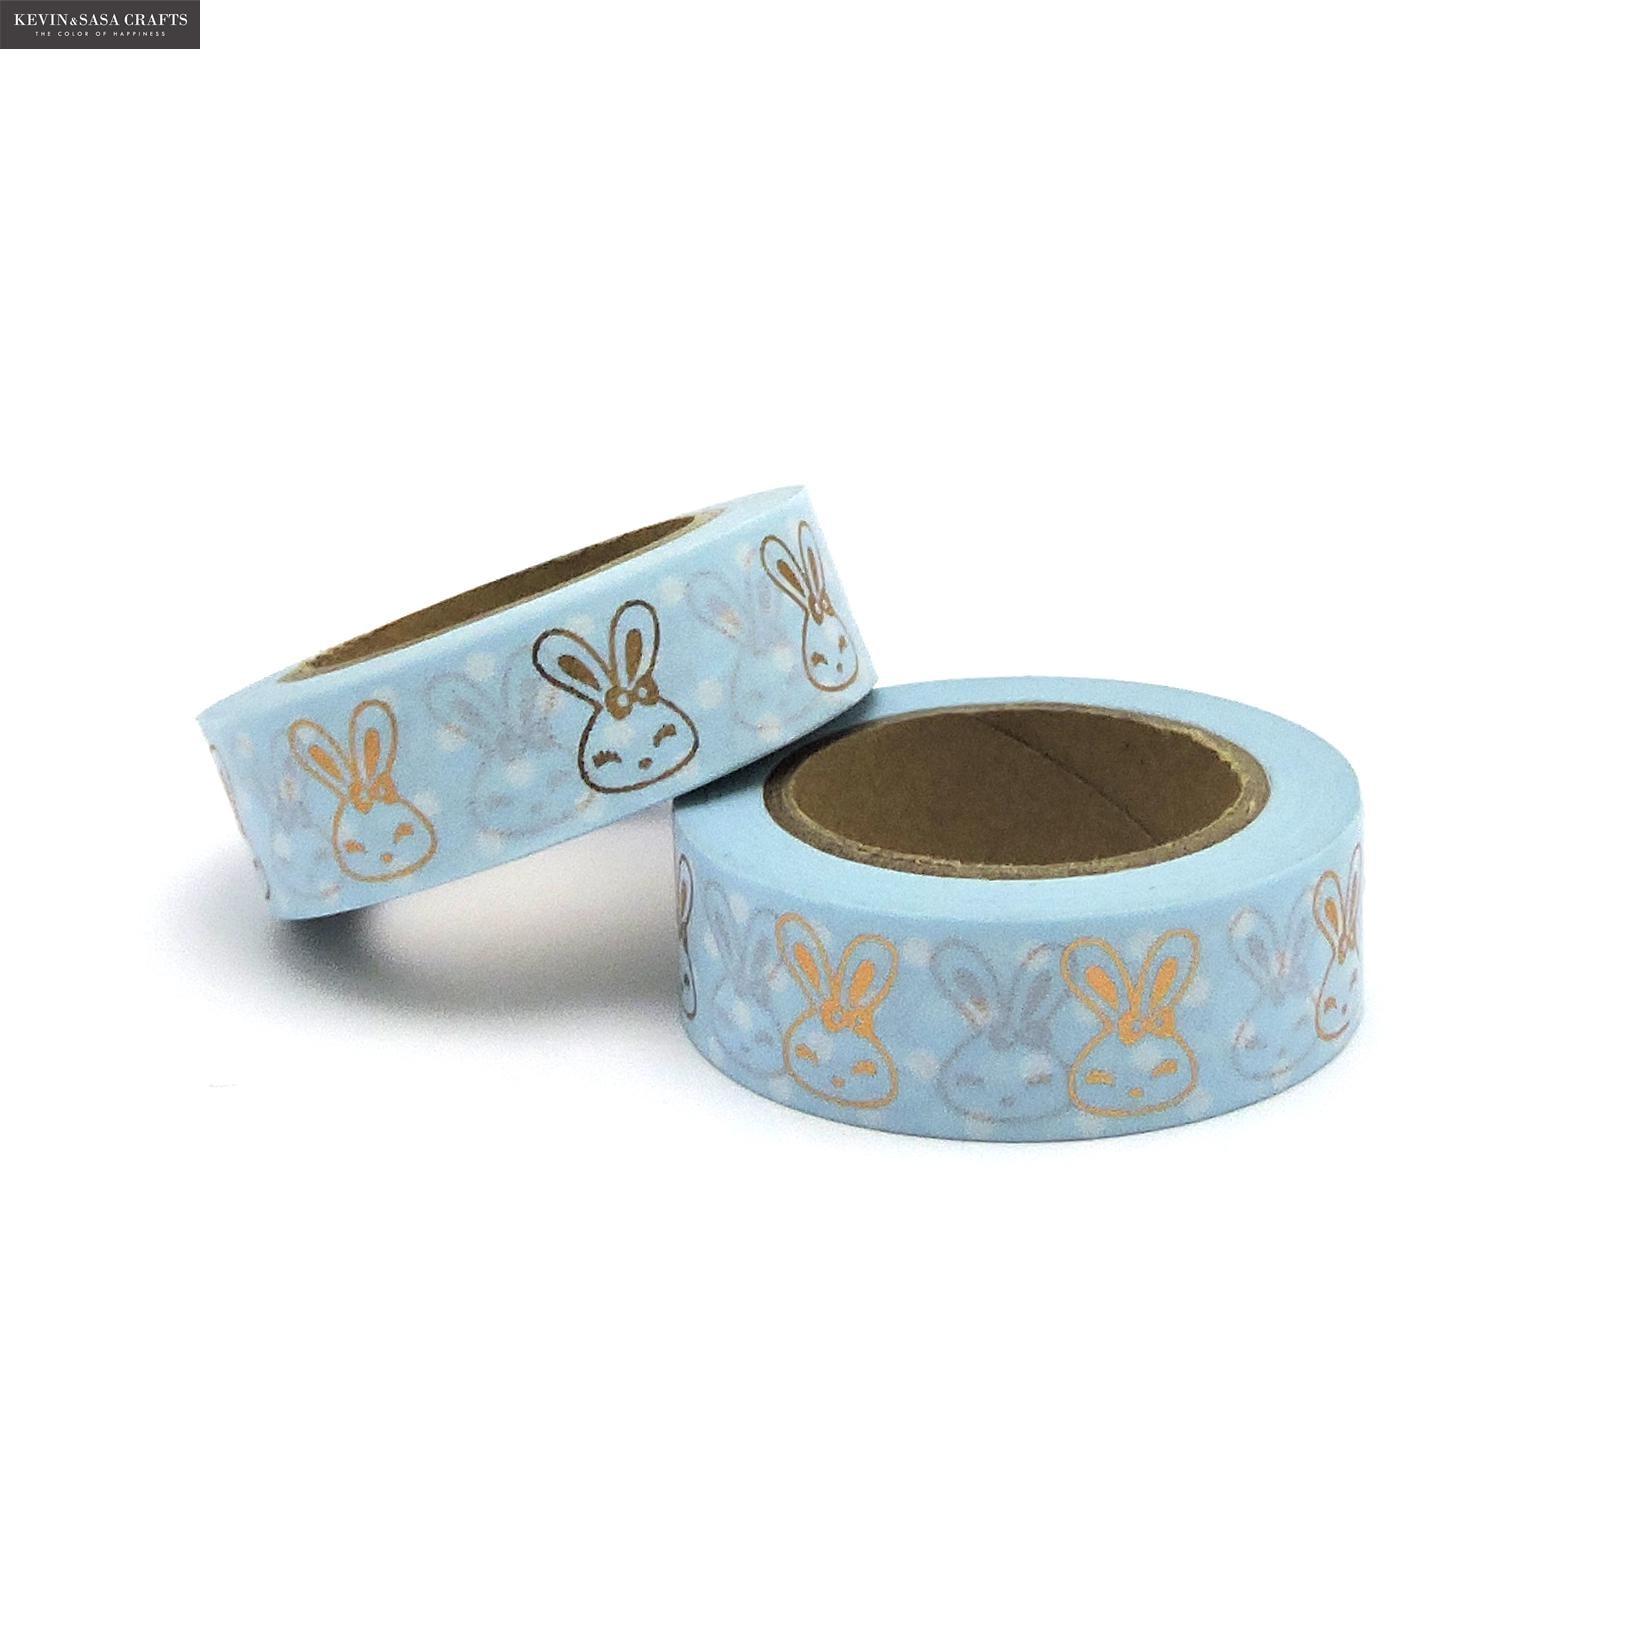 Rabbit Washi Tape Gold Foil Tape Stationery Decorative Tape Scrapbooking Photo Album School Tools Kawaii Scrapbook Paper